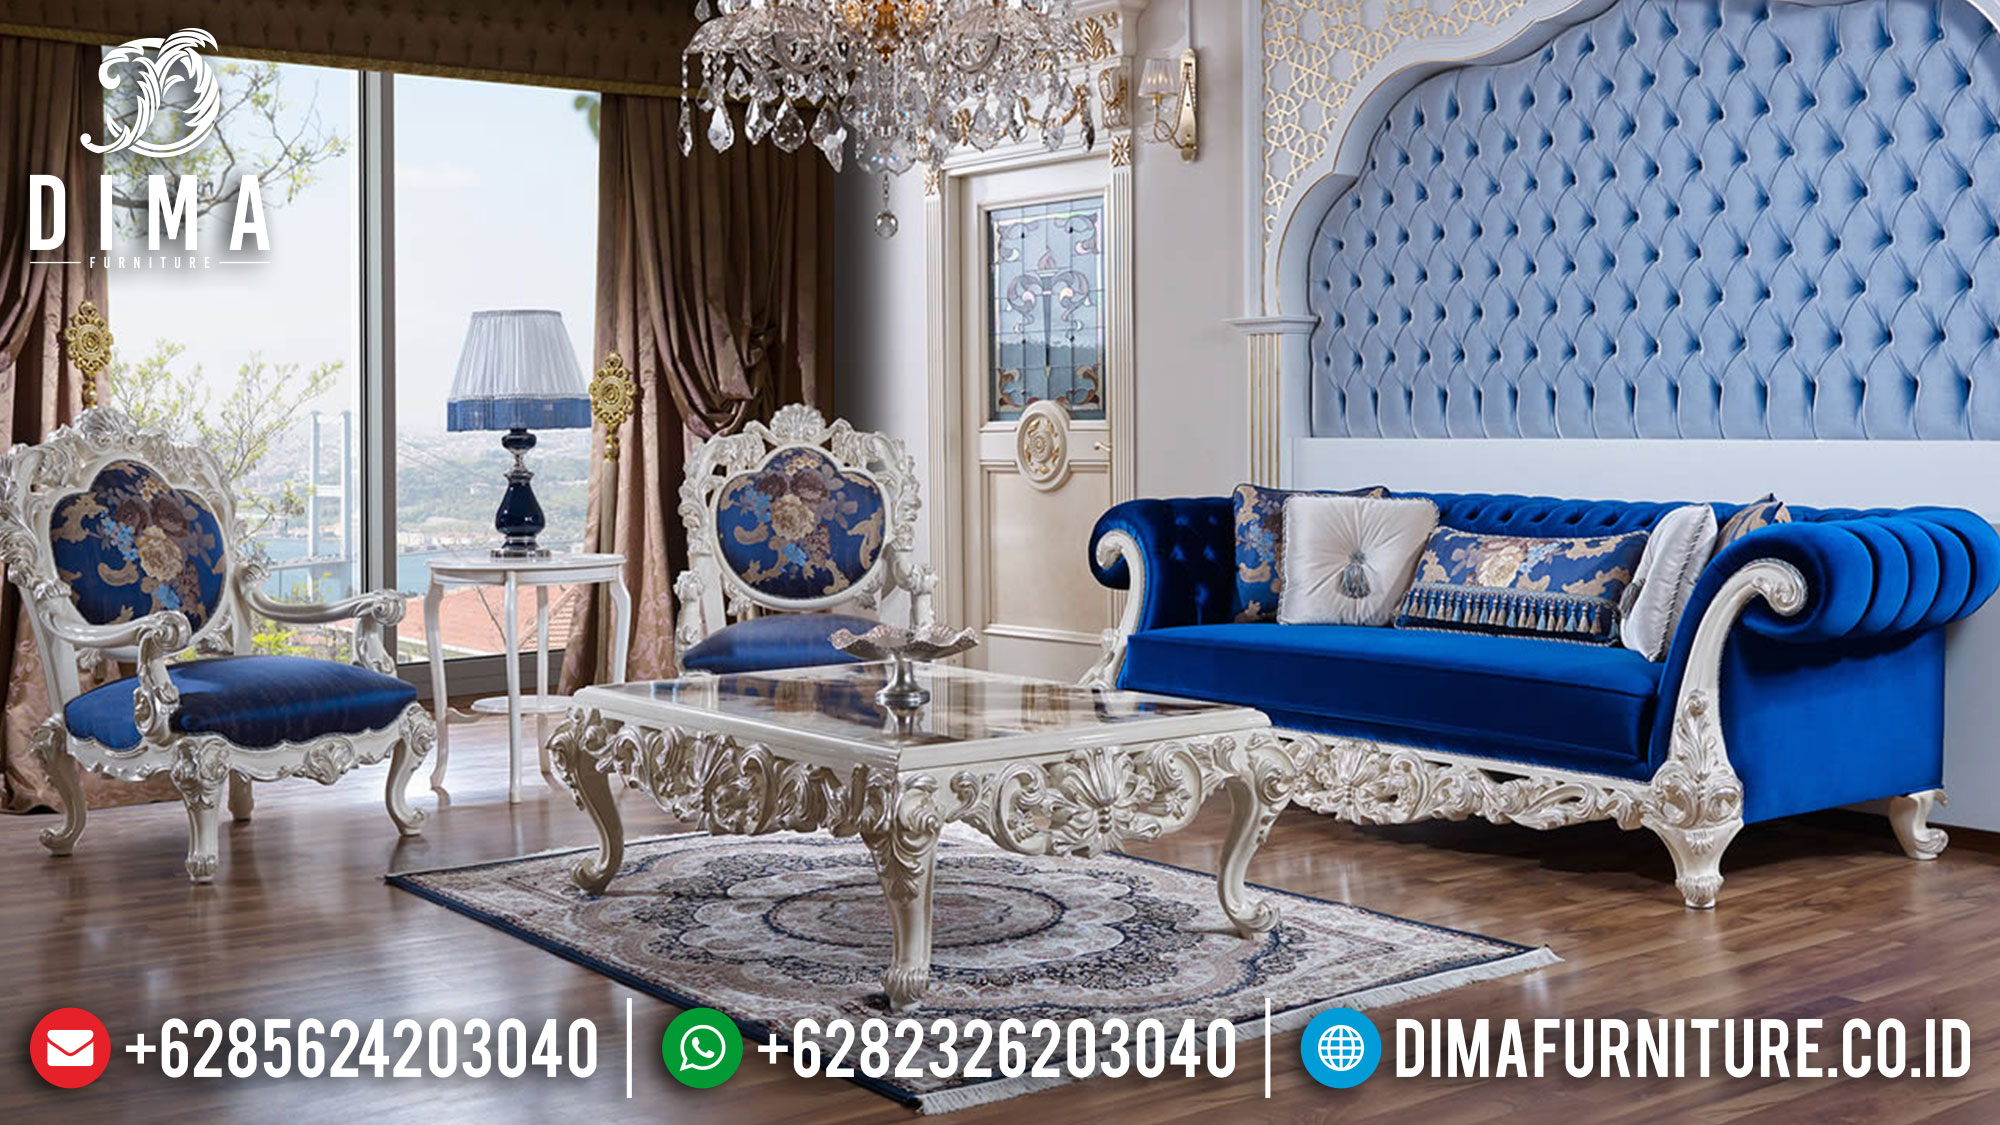 For Sale Sofa Tamu Ukir Jepara White Duco Combination Color Luxury Classic Mm-0991